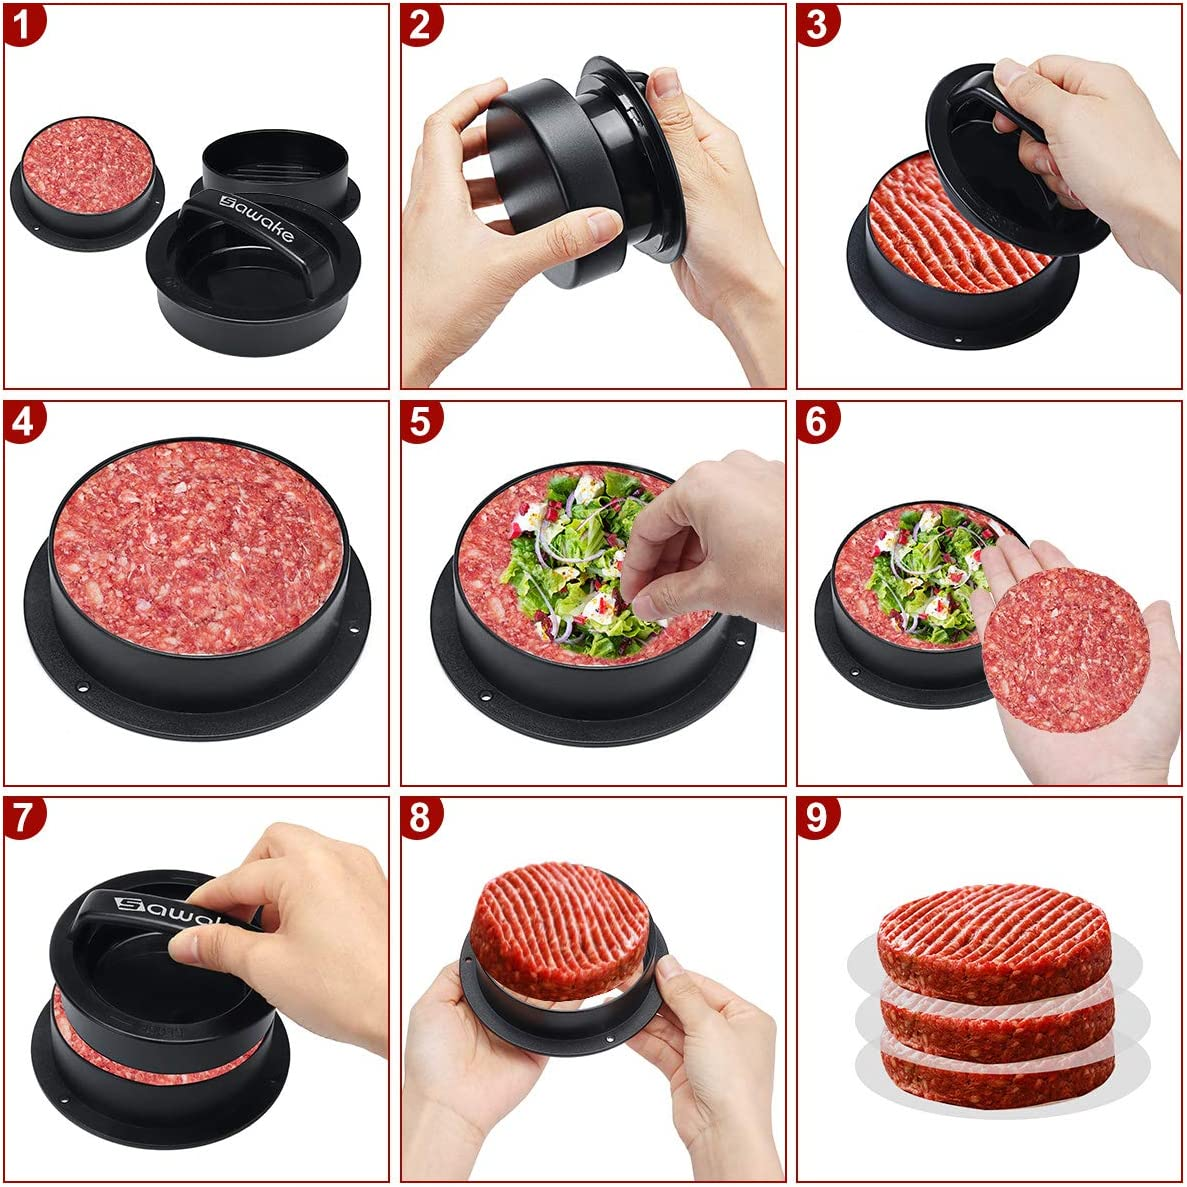 hacer hamburguesas de verduras con prensa